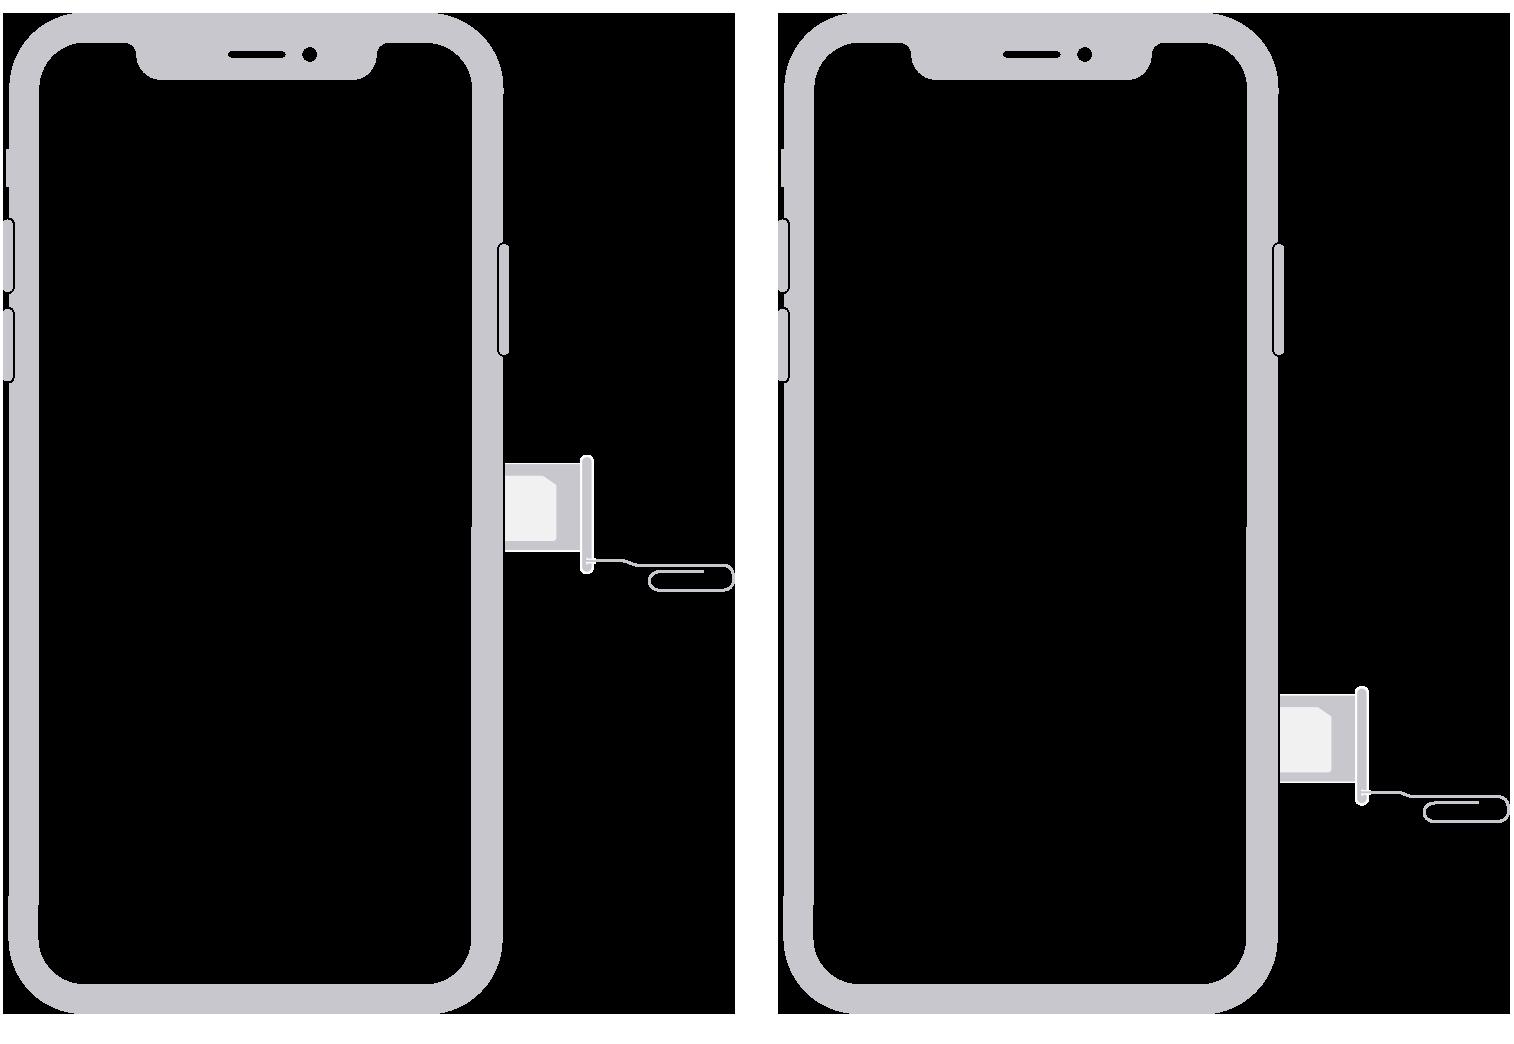 remove SIM crad on iPhone